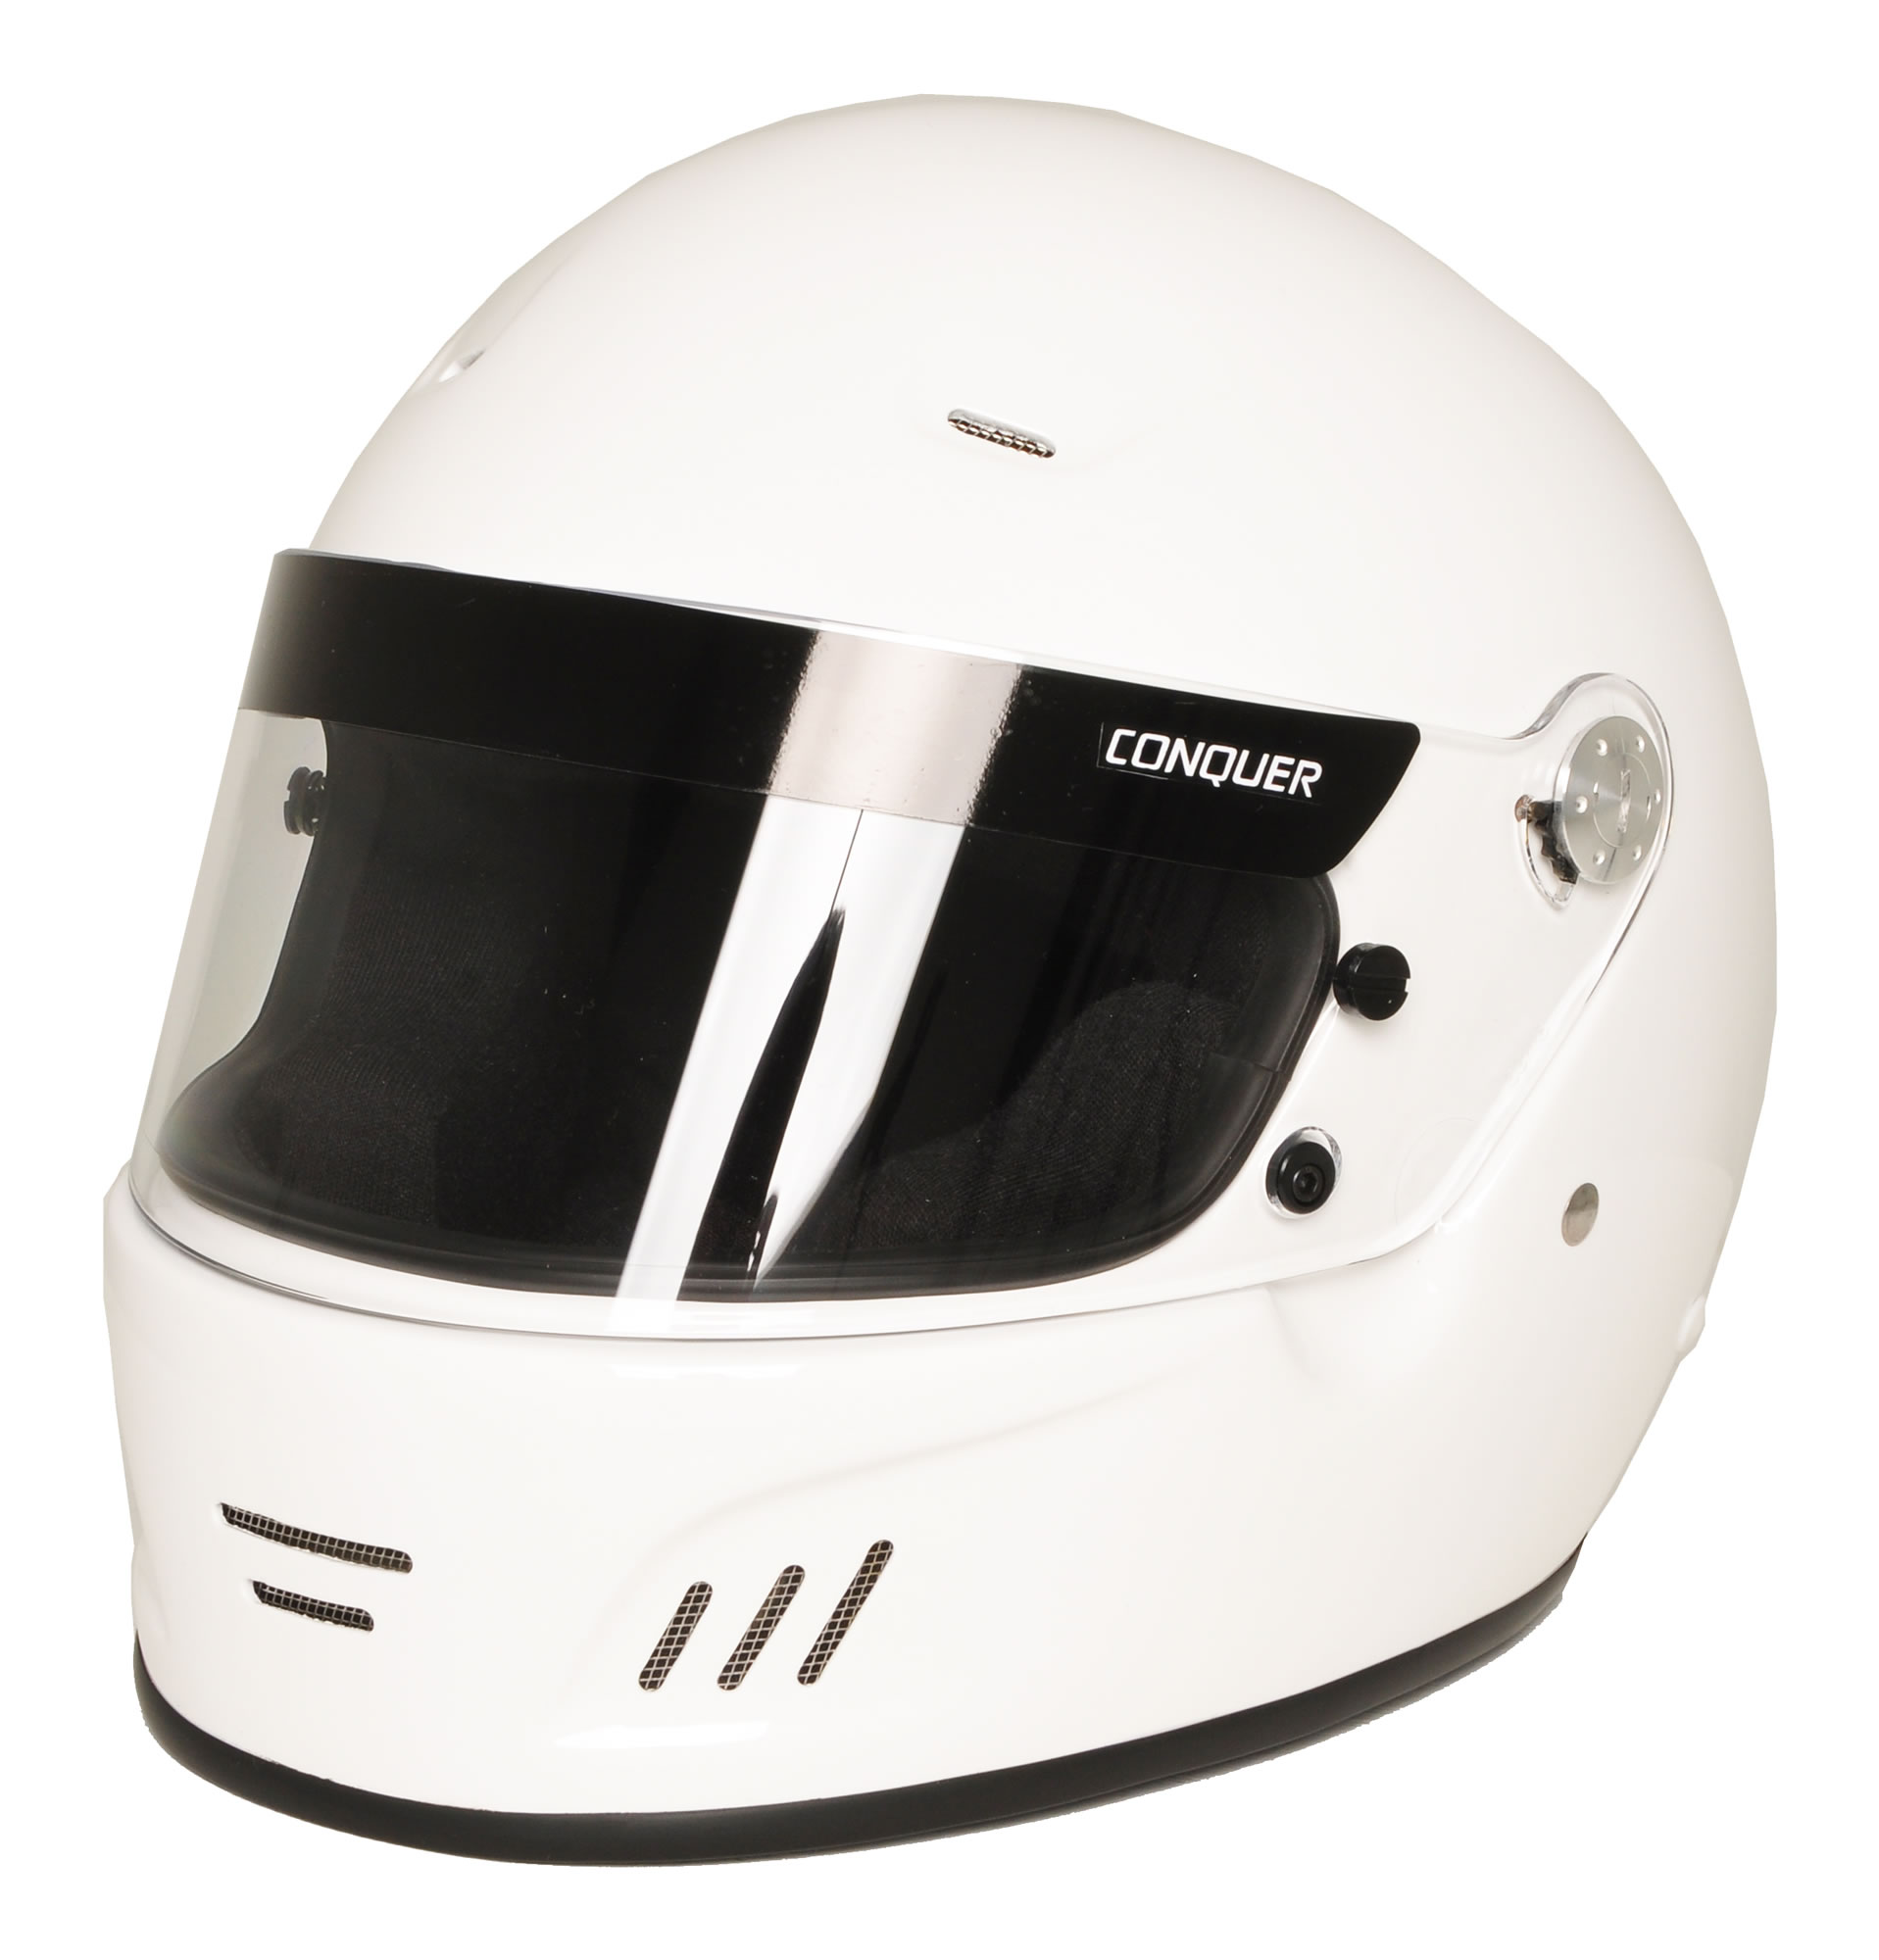 Auto Racing Helmets >> Conquer Snell Sa2015 Approved Full Face Auto Racing Helmet Walmart Com